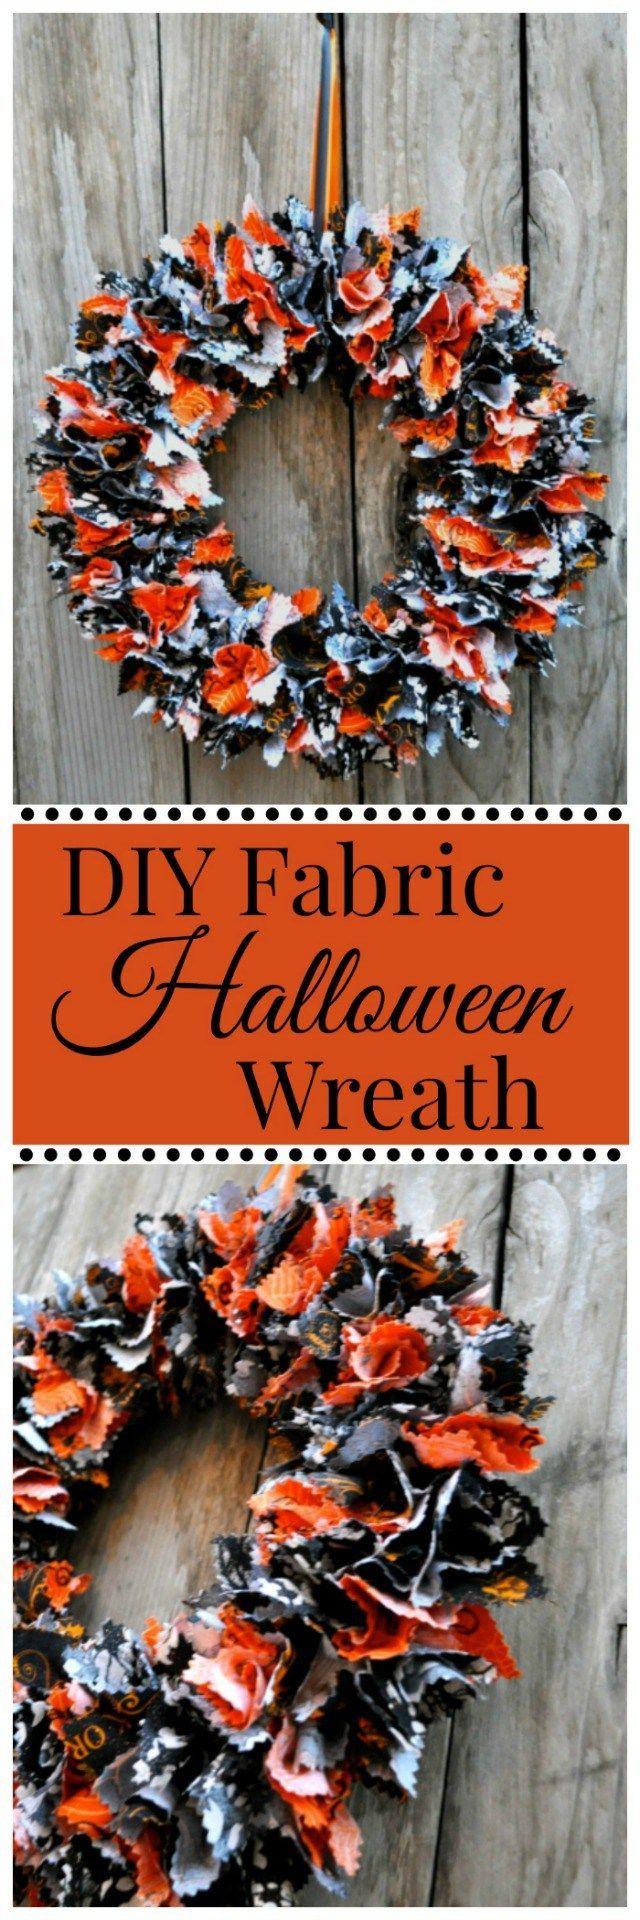 DIY Fabric Halloween Wreath Tutorial - Simple Sojourns